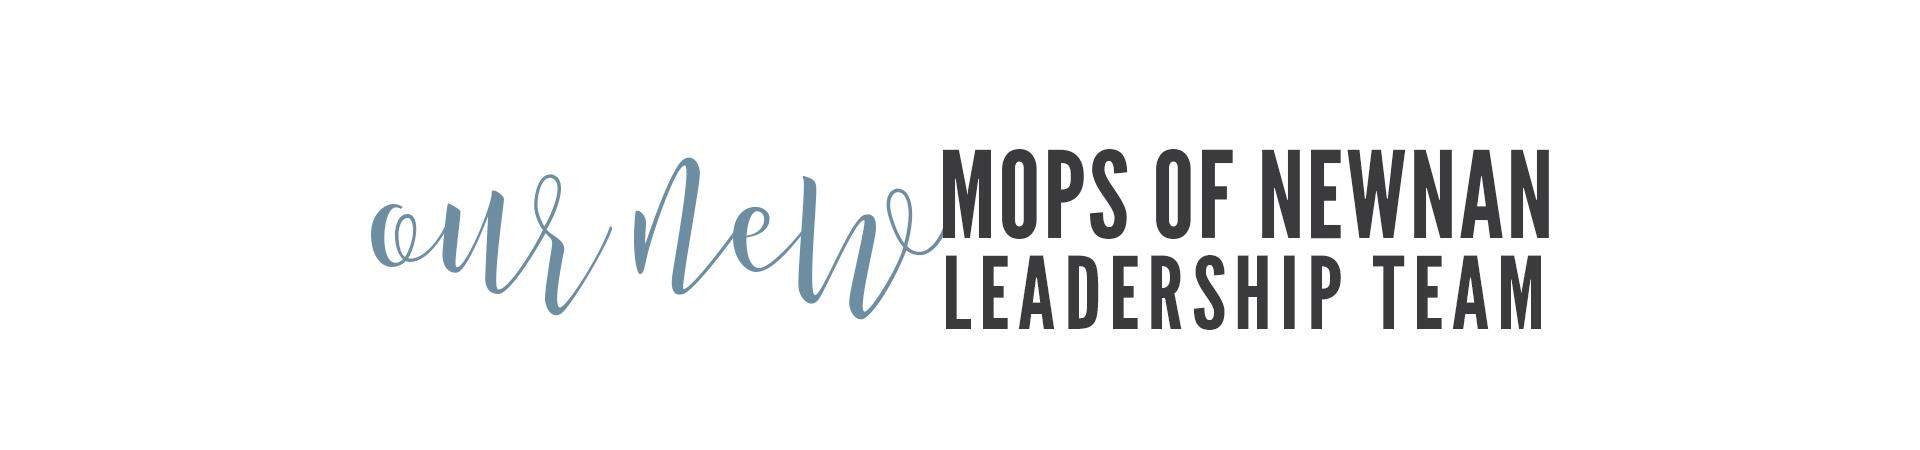 2019-2020 MOPS of Newnan Leadership Team